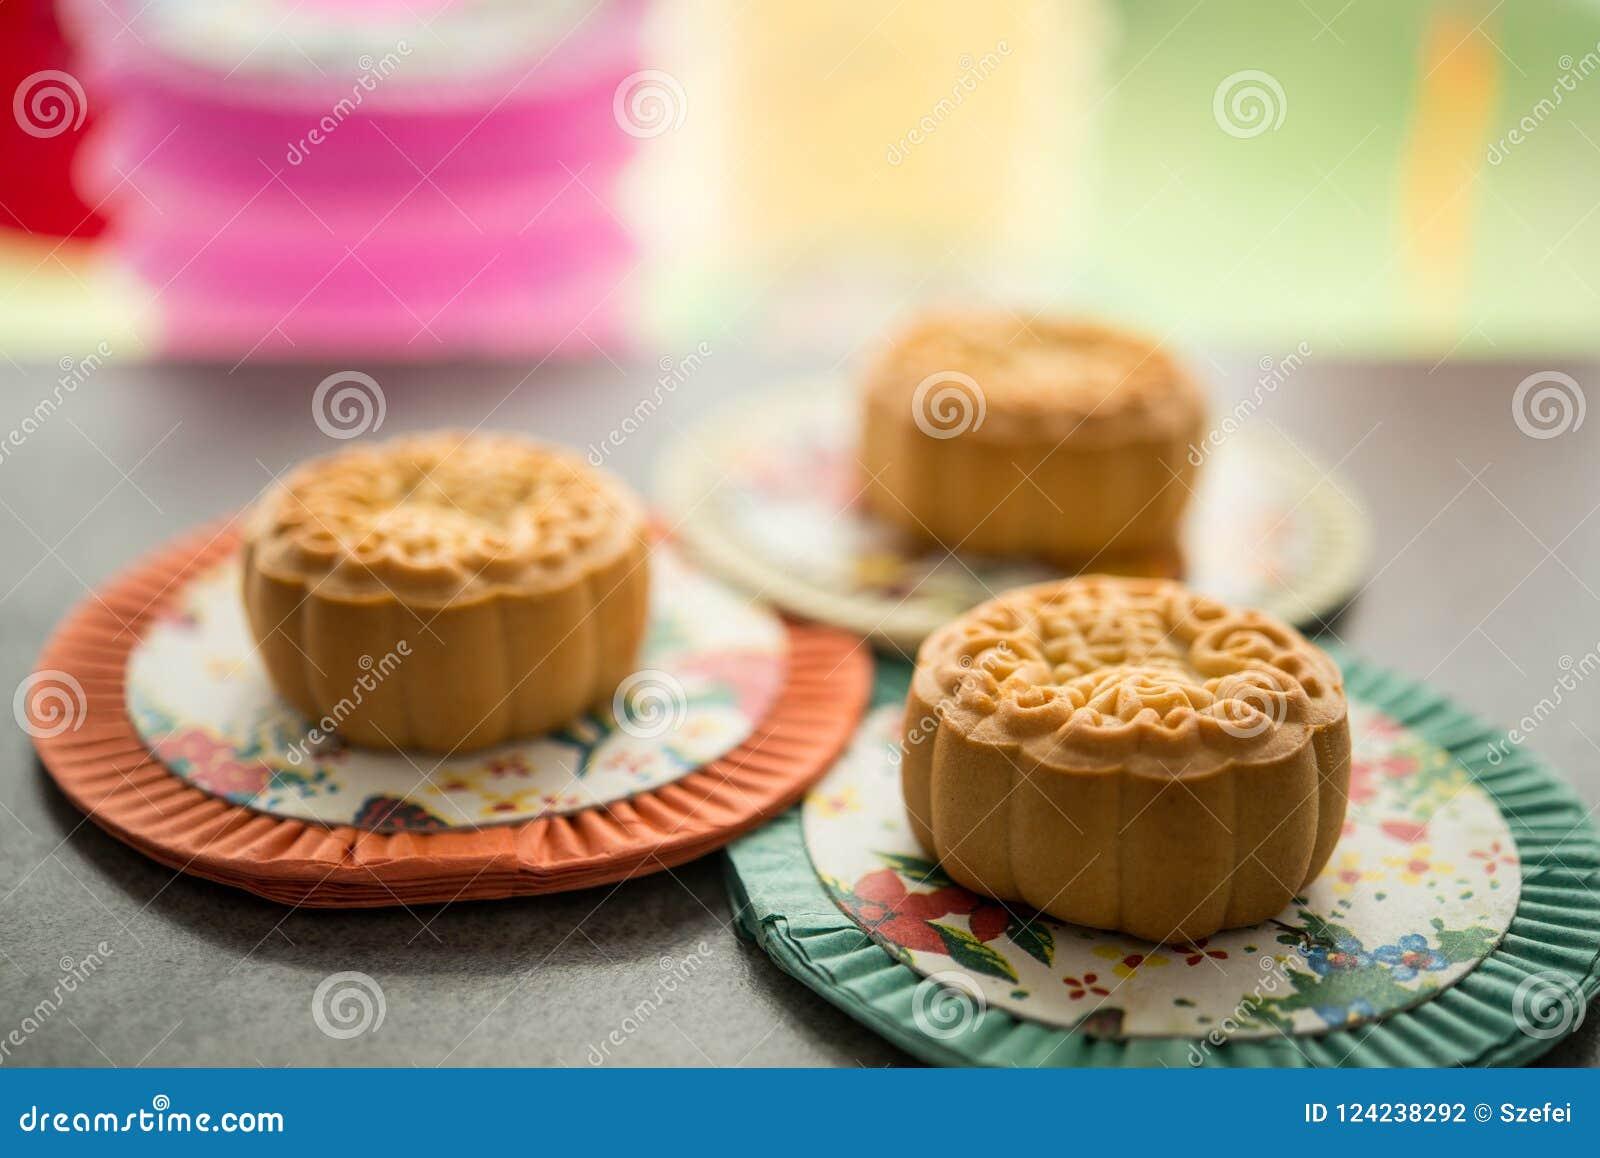 mooncakes and mid autumn lanterns stock photo image of celebration